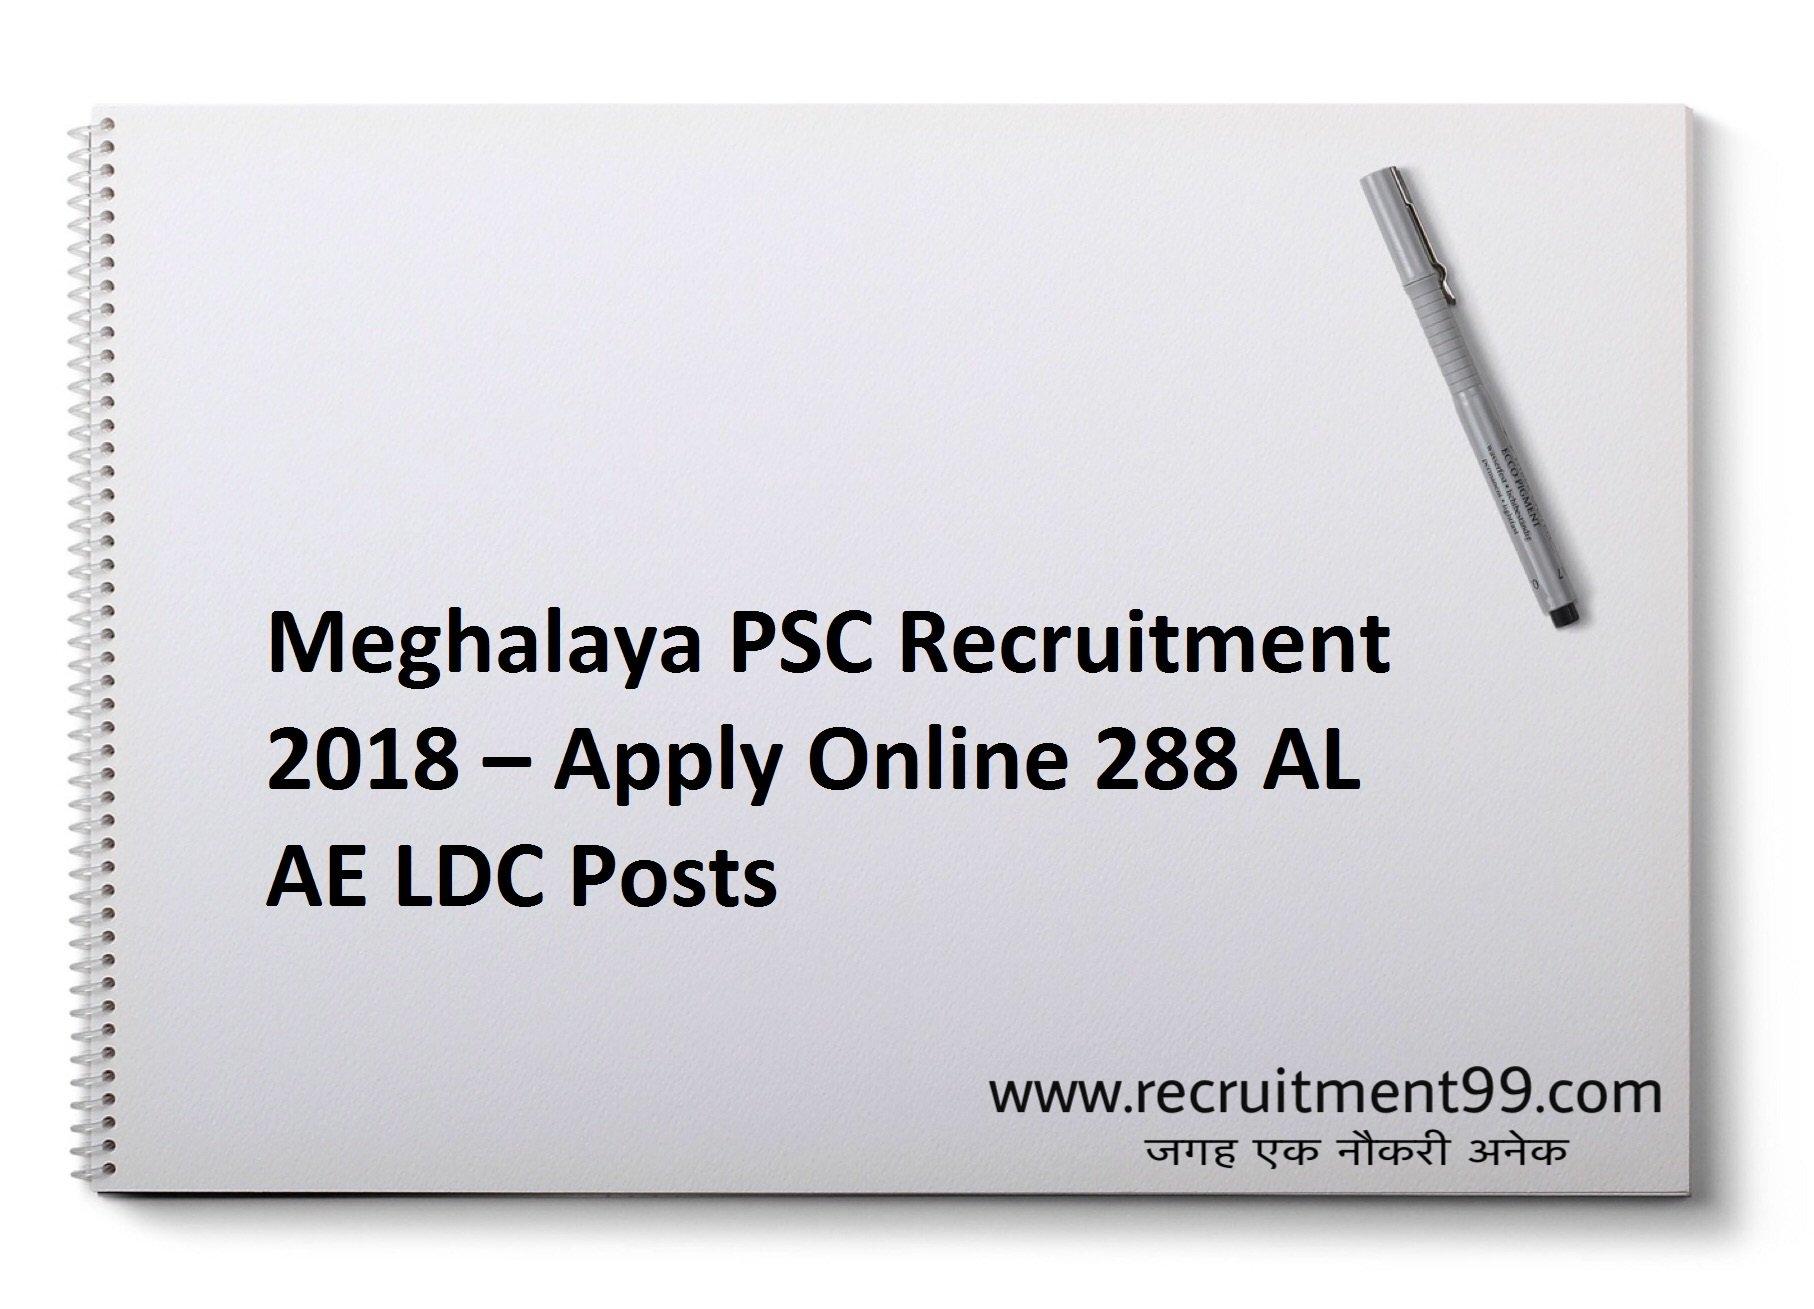 Meghalaya PSC AL AE LDC Recruitment Admit Card & Result 2018